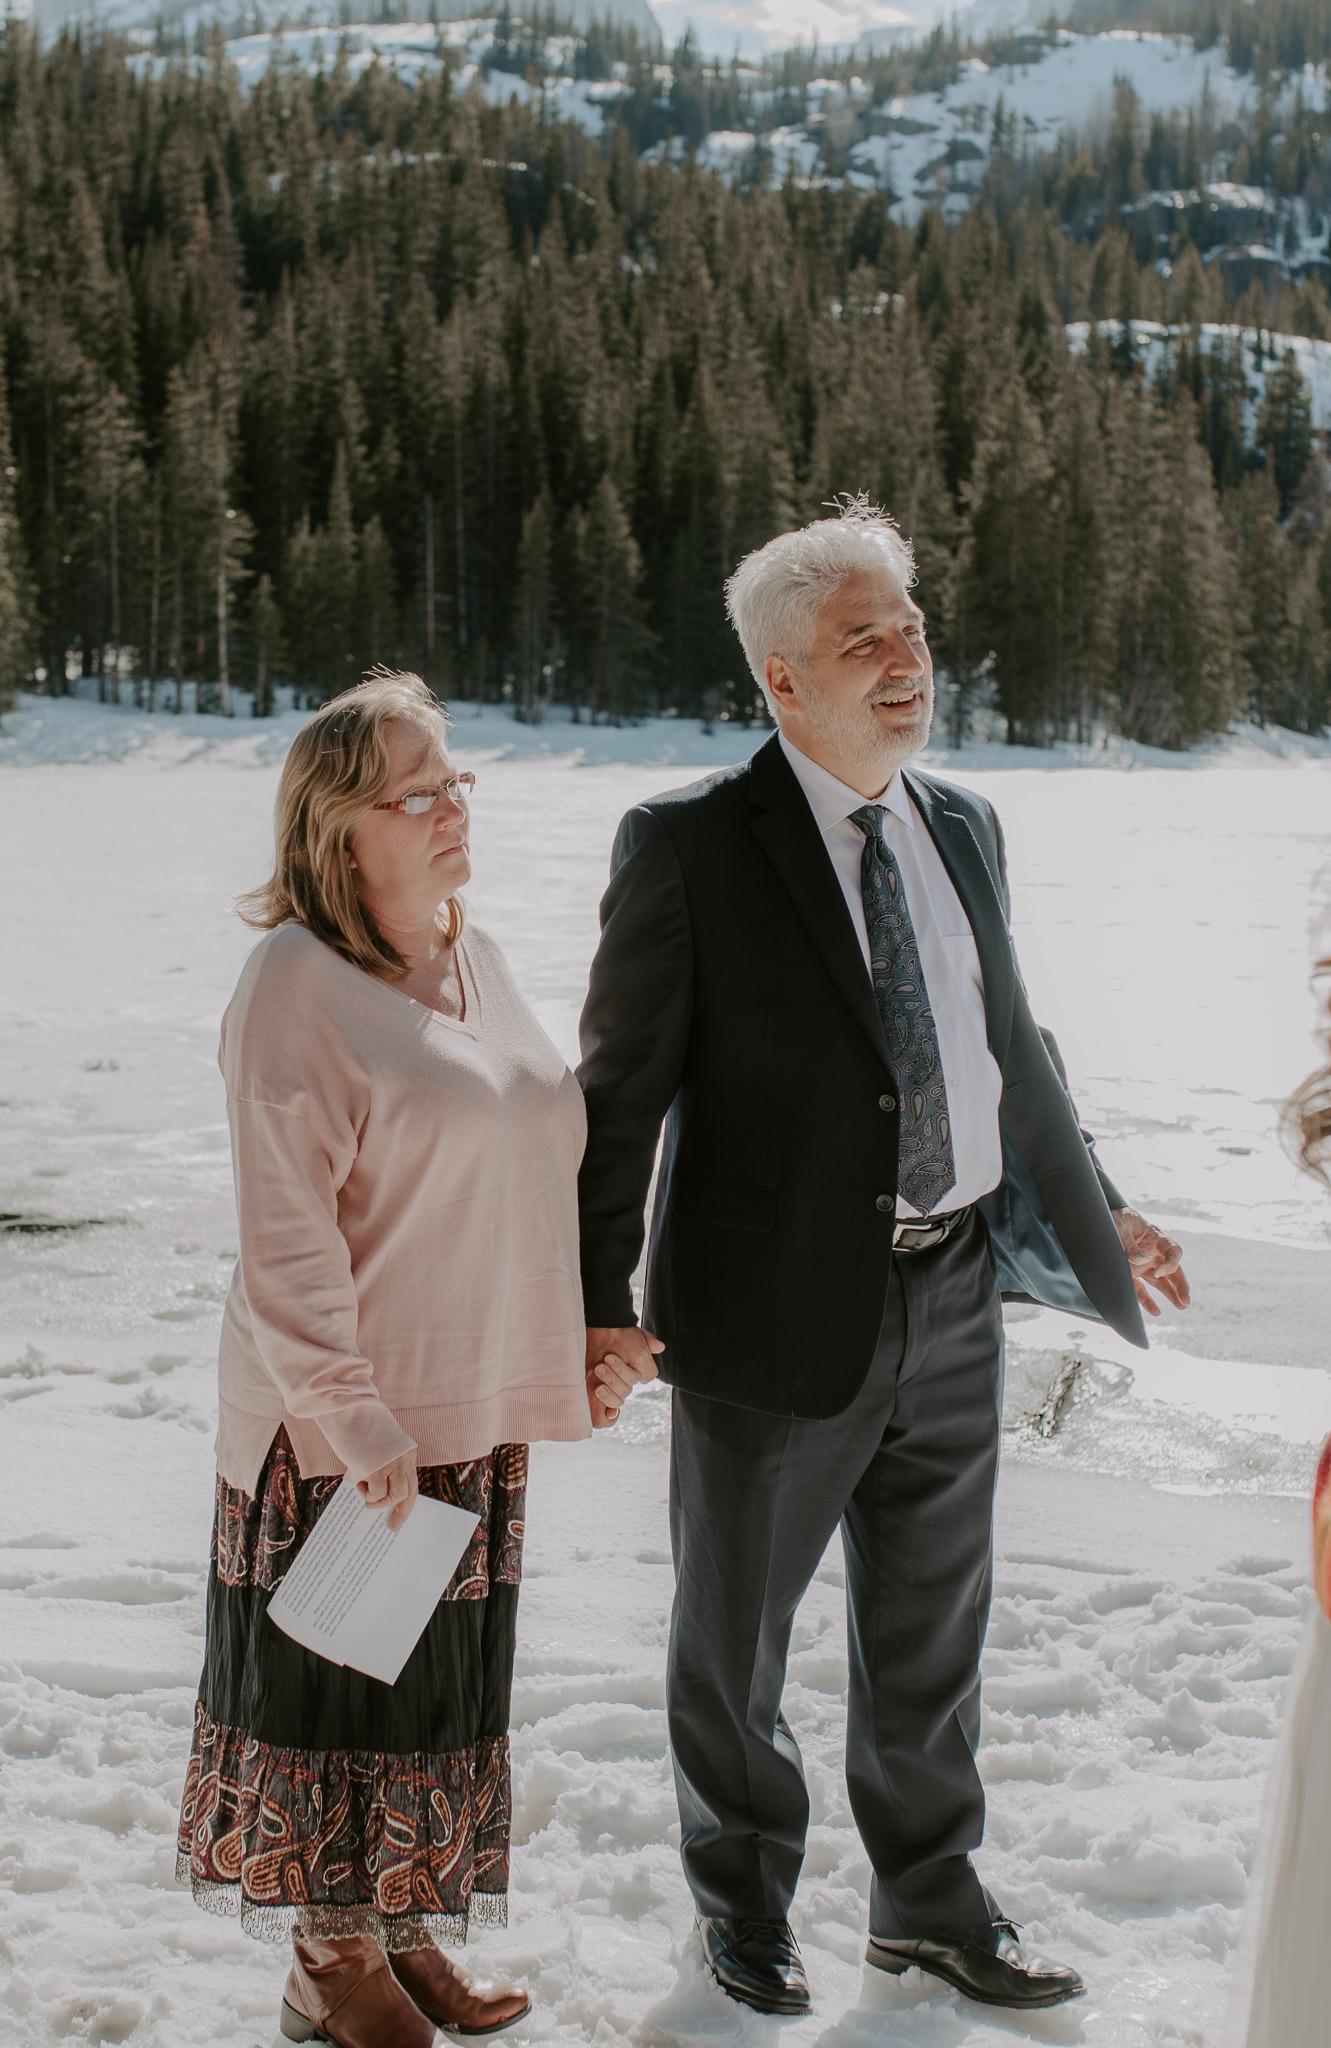 Colorado adventure elopement photographer. Bear Lake winter elopement.